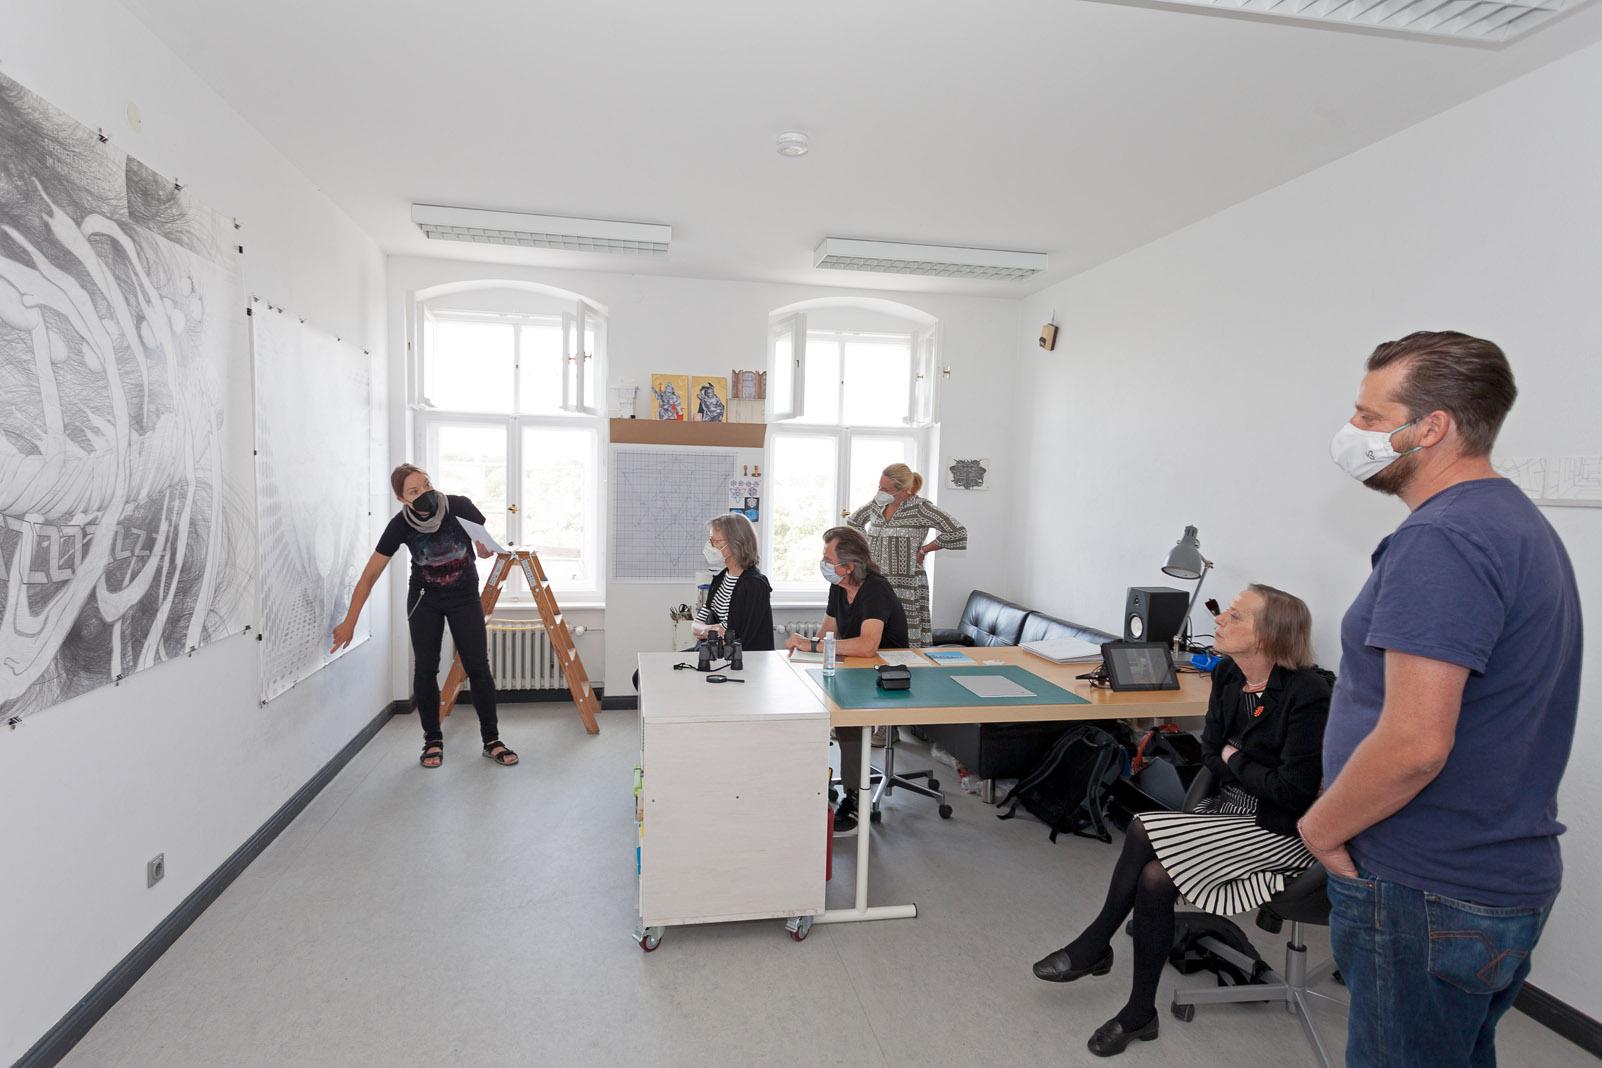 Atelierspaziergang mit Dr. Dorothée Bauerle Willert, Atelier Tatjana Preuss